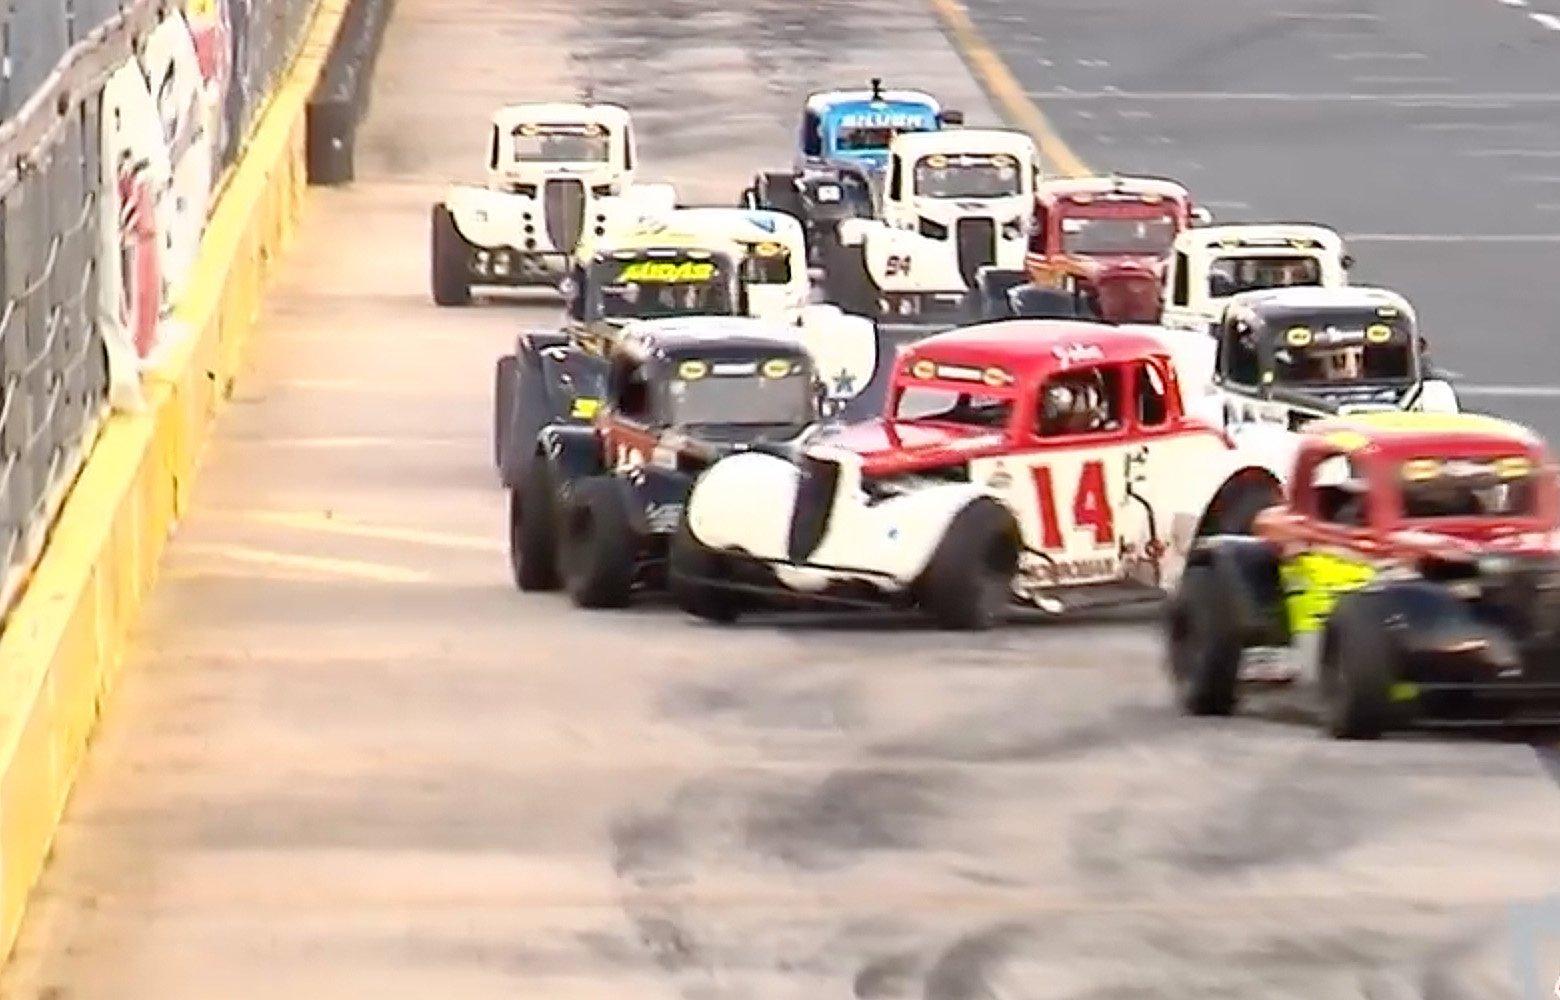 Johnny sossoman archives racing news for Charlotte motor speedway drag racing